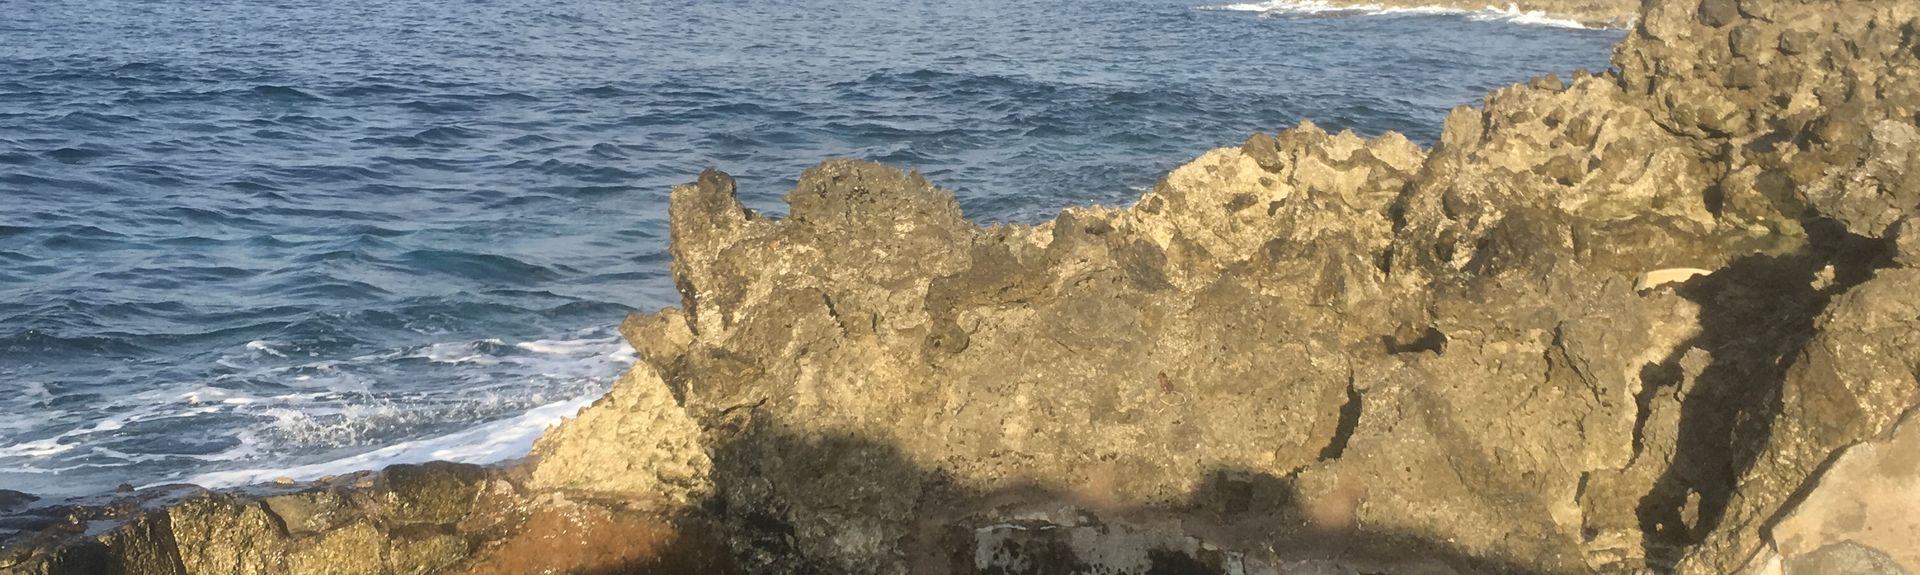 Bloody Bay Beach, Negril, Hanover, Jamaica